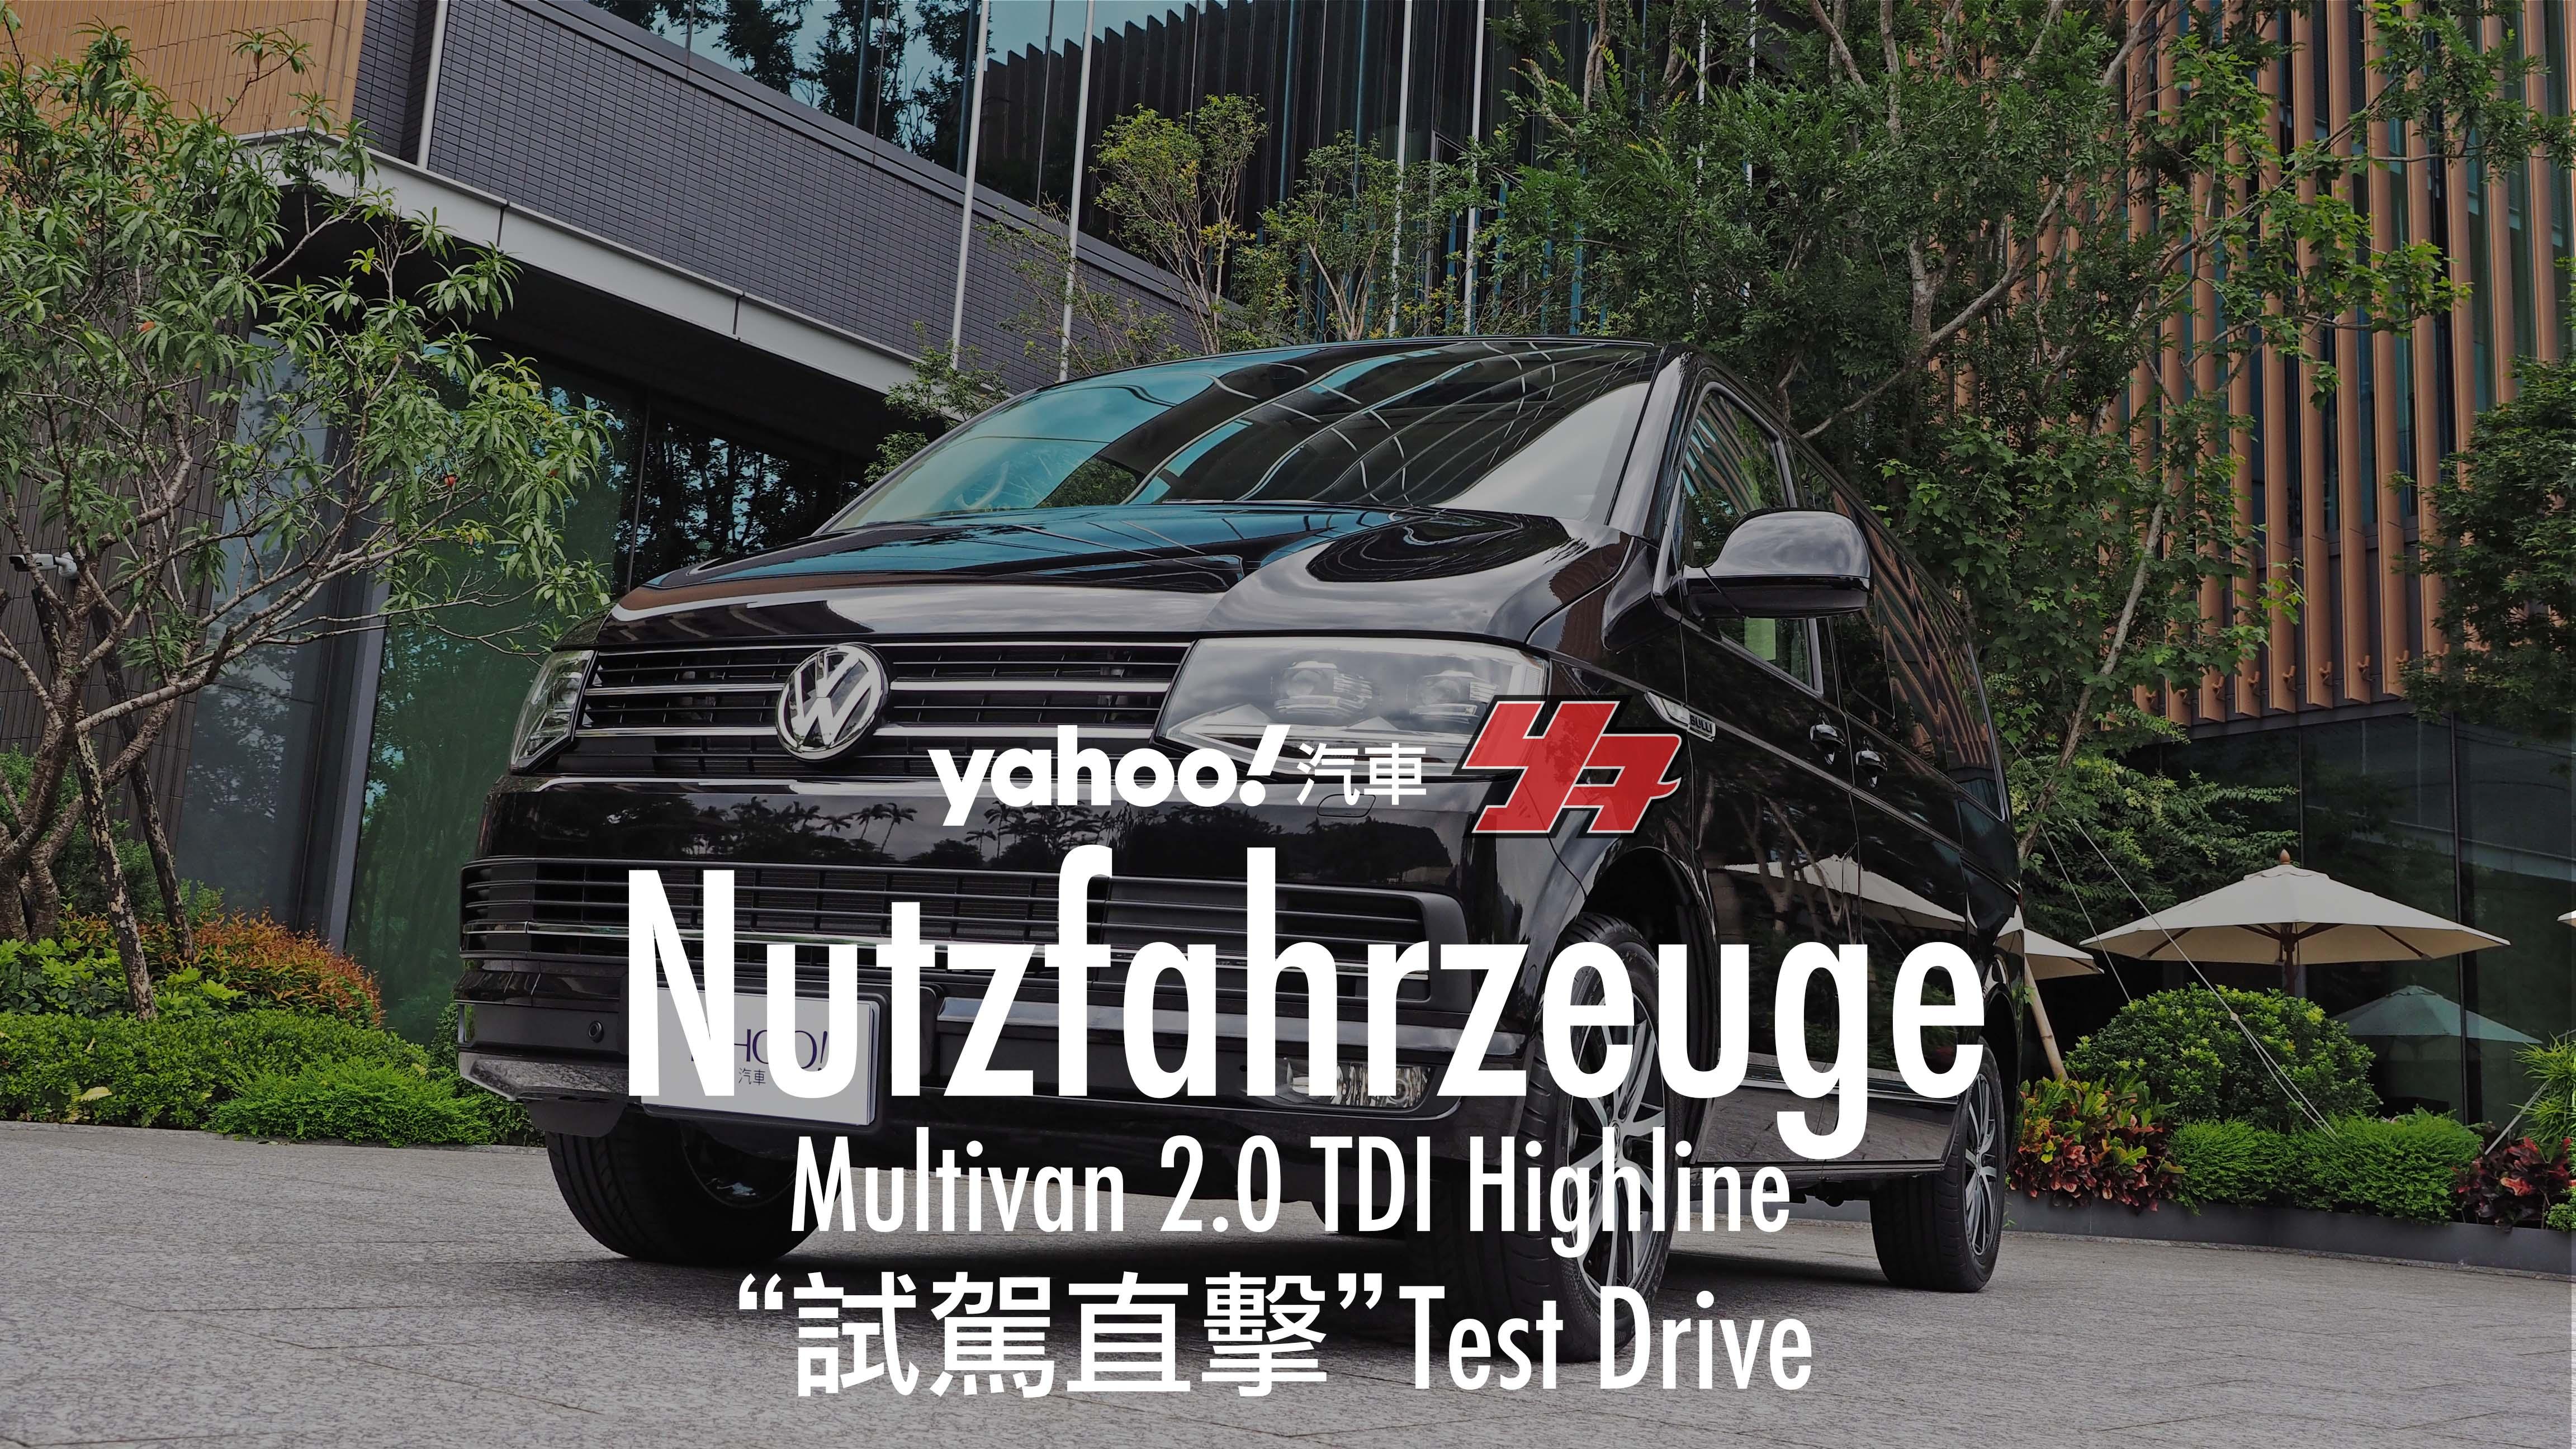 【試駕直擊】Van Life於都會叢林間!2019 Volkswagen T6 Multivan Highline都會試駕